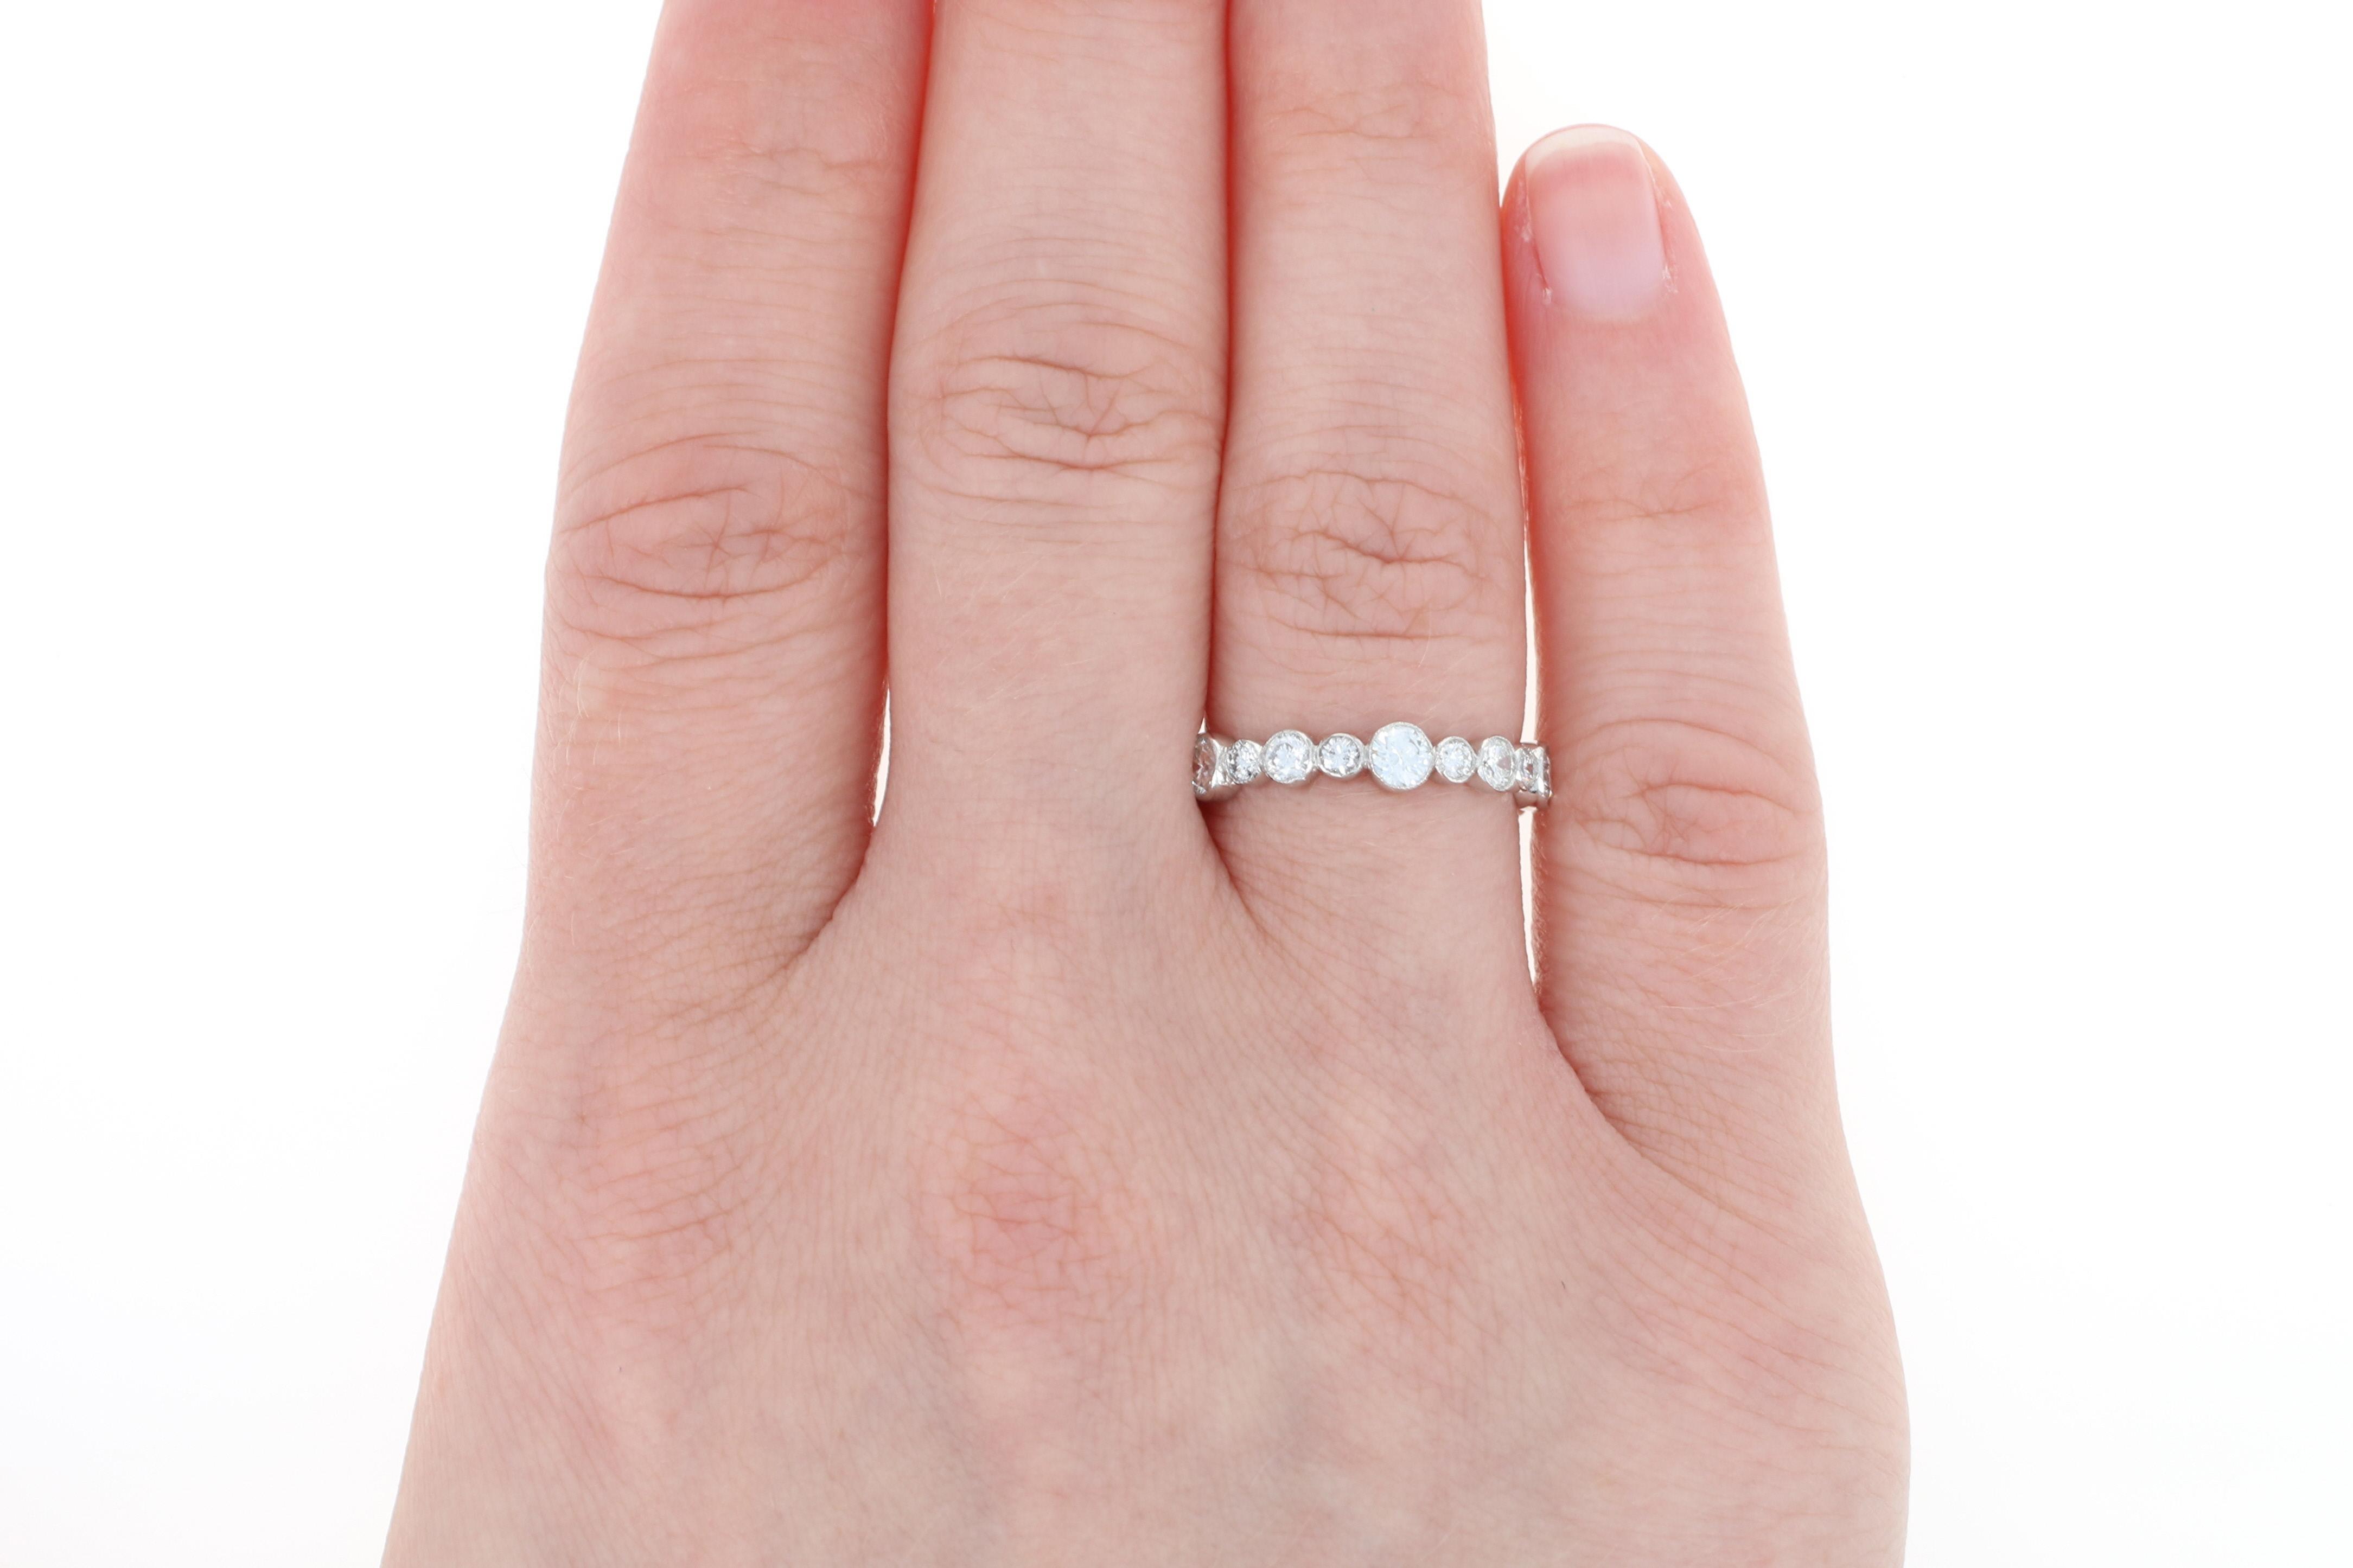 Tiffany & Co. Diamond Eternity Band - 950 Platinum Wedding Ring ...